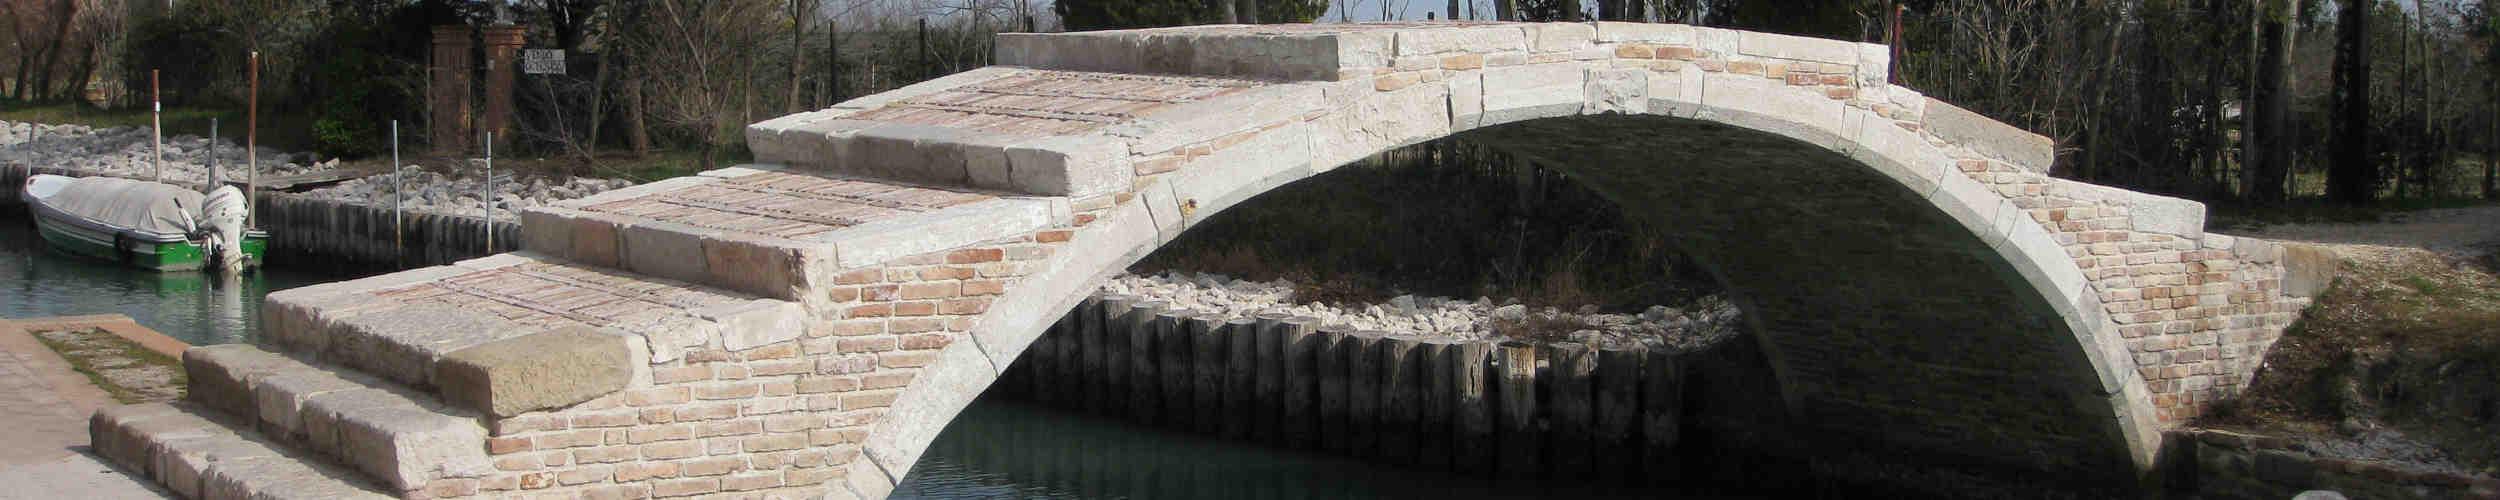 devil 'bridge in torcello